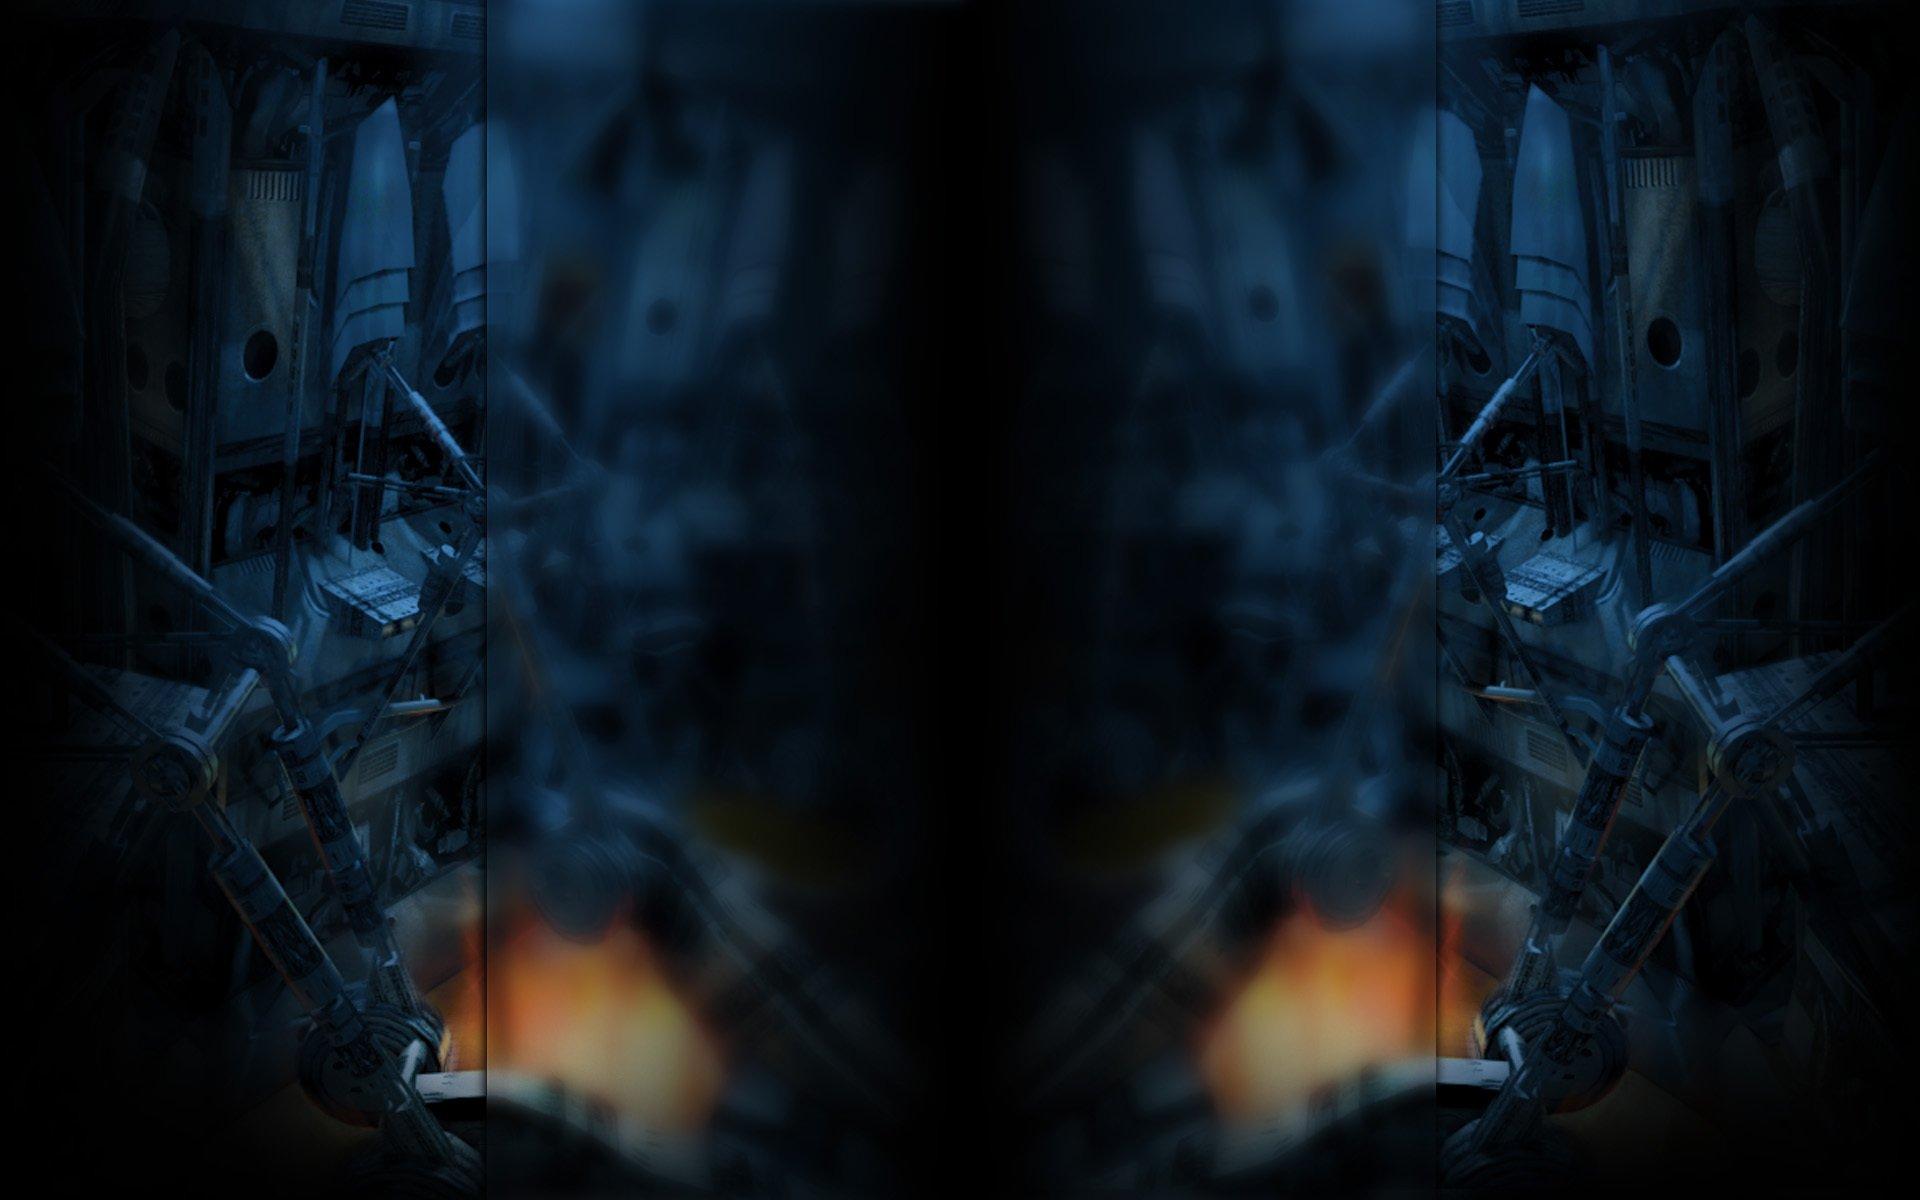 Half Life 2 Hd Wallpaper Background Image 1920x1200 Id